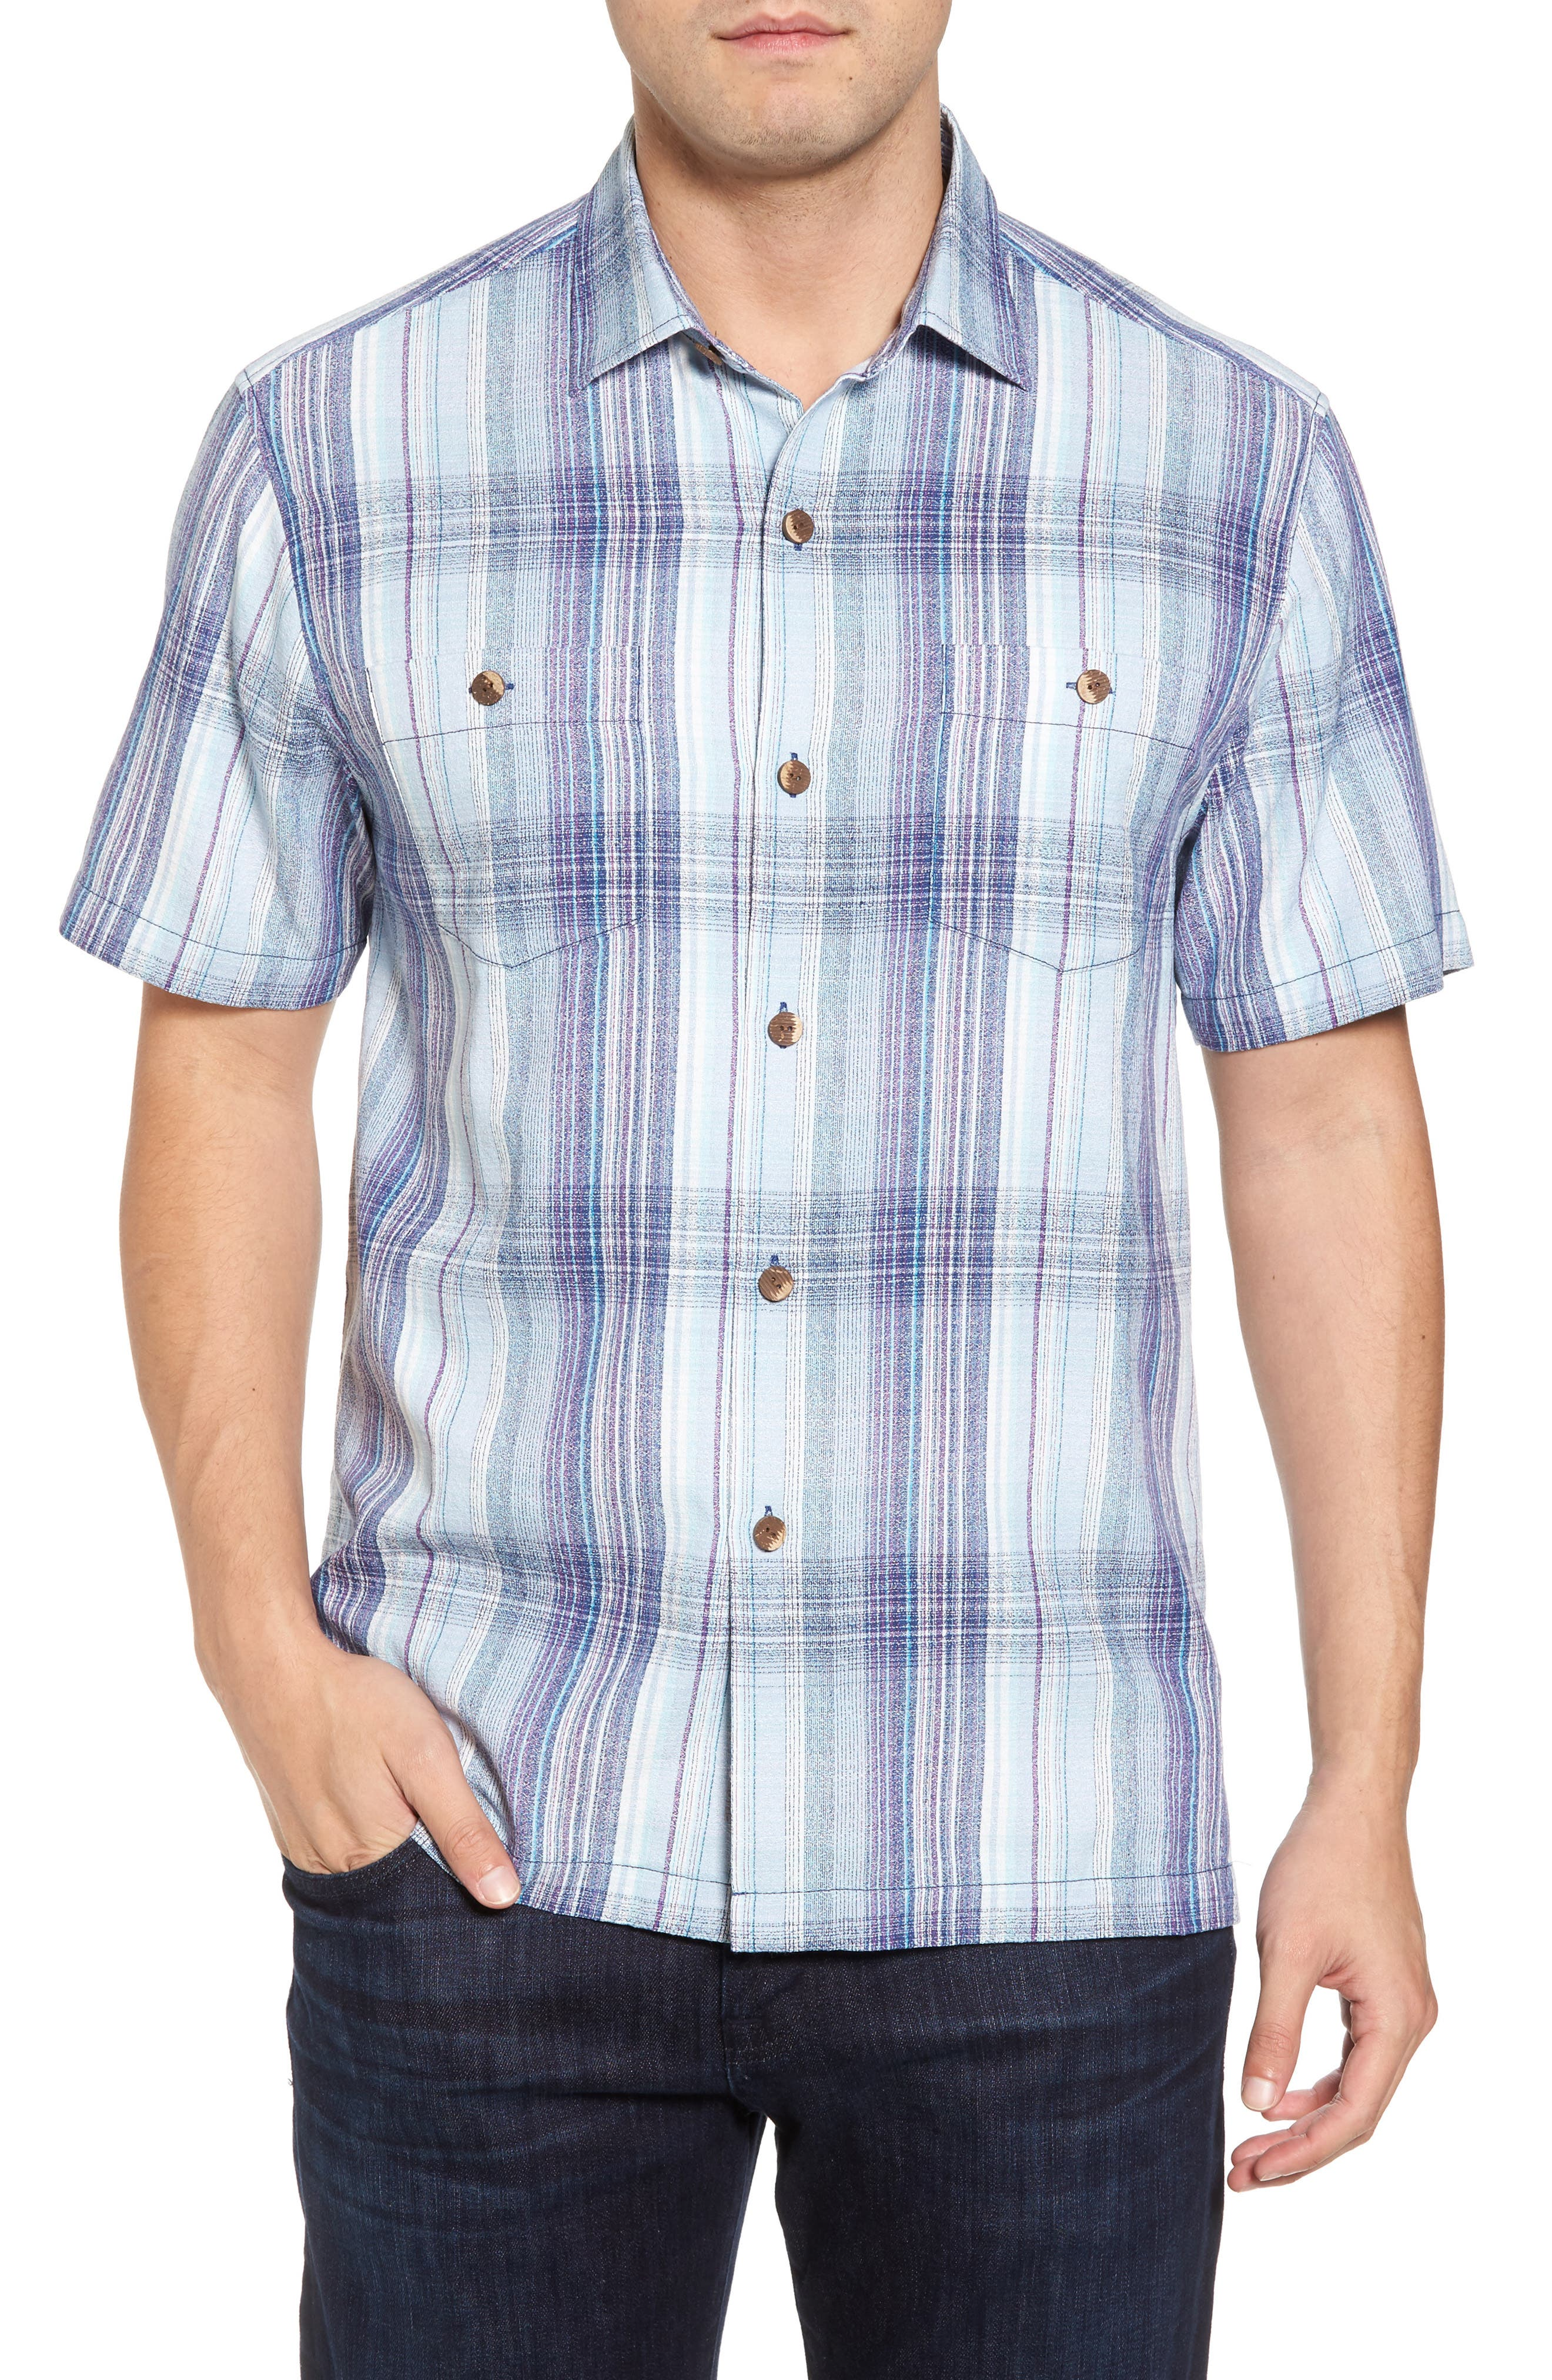 Alternate Image 1 Selected - Tommy Bahama Banyan Cay Regular Fit Silk Blend Sport Shirt